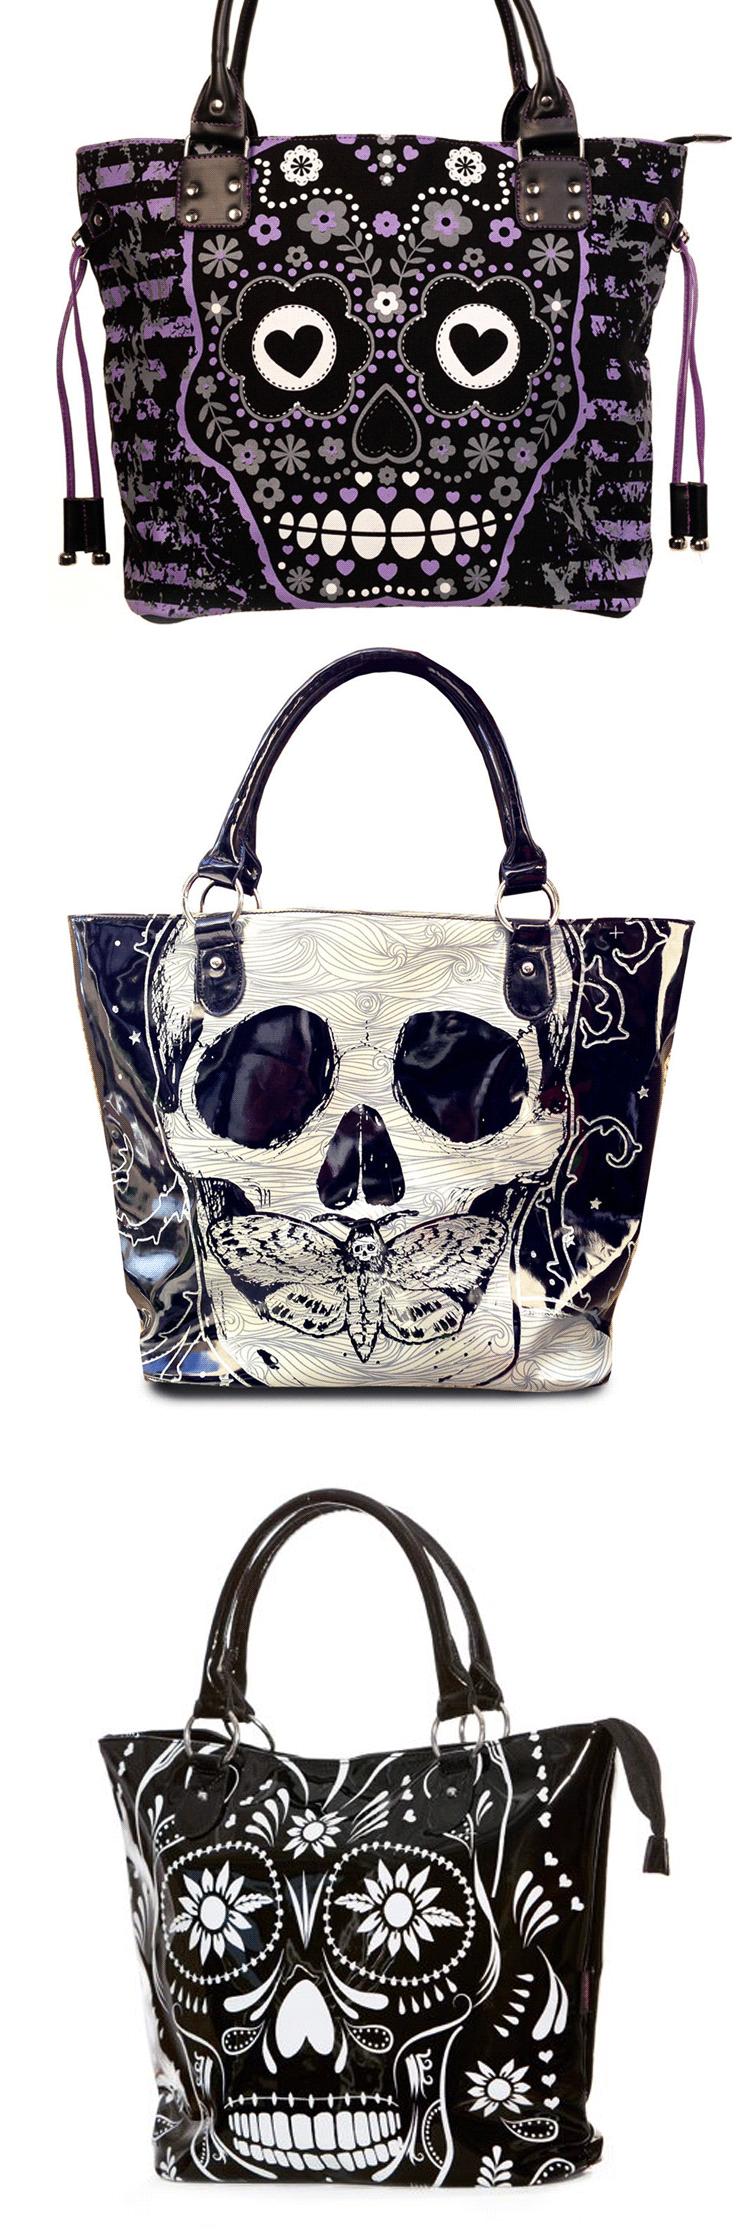 The Gothic Shop USA | Mochila de moda, Bolsa de calavera